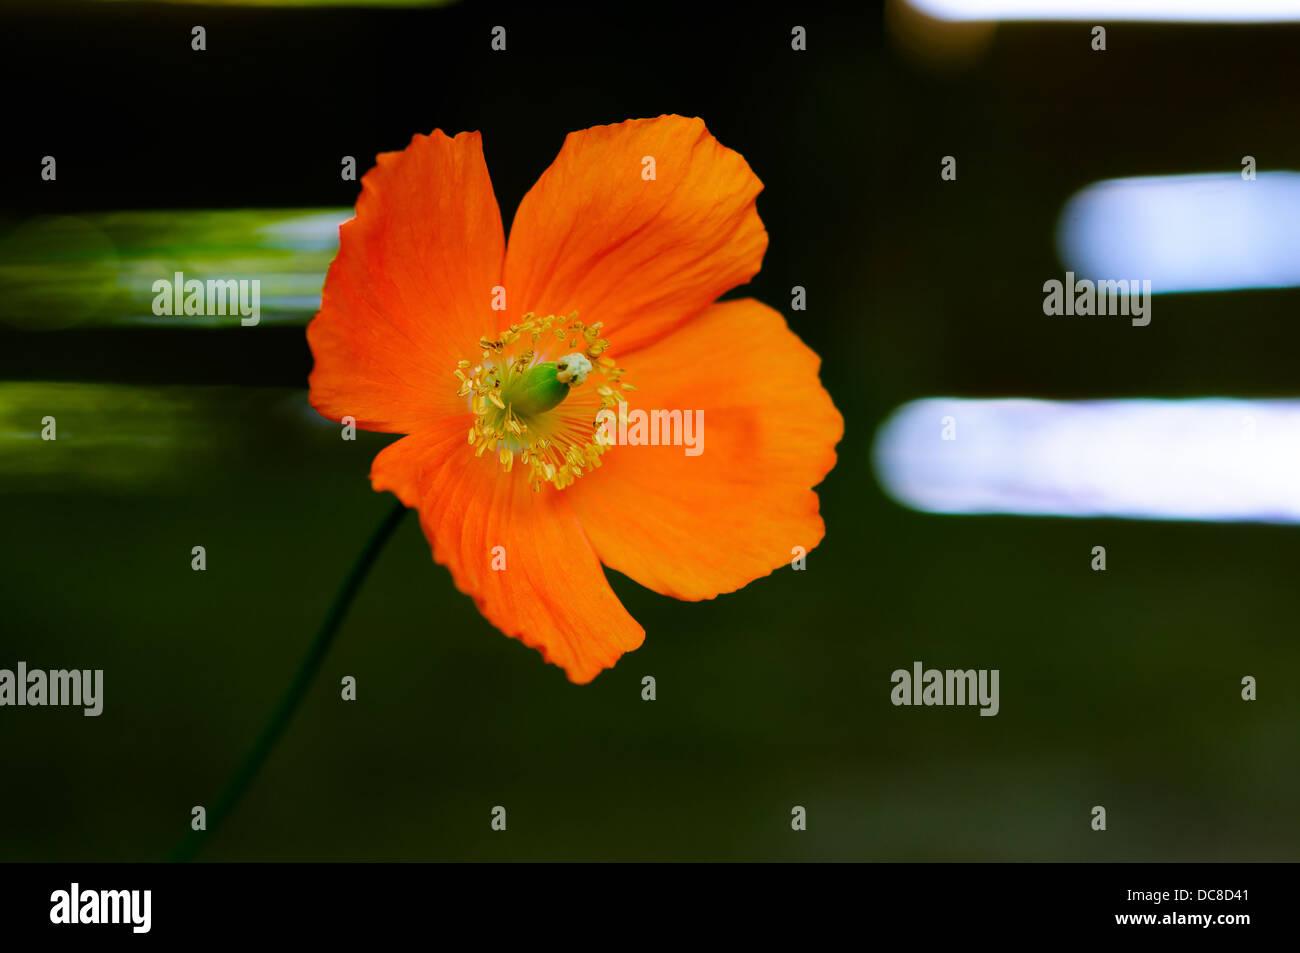 Eschscholzia California poppy wild flower head - Stock Image